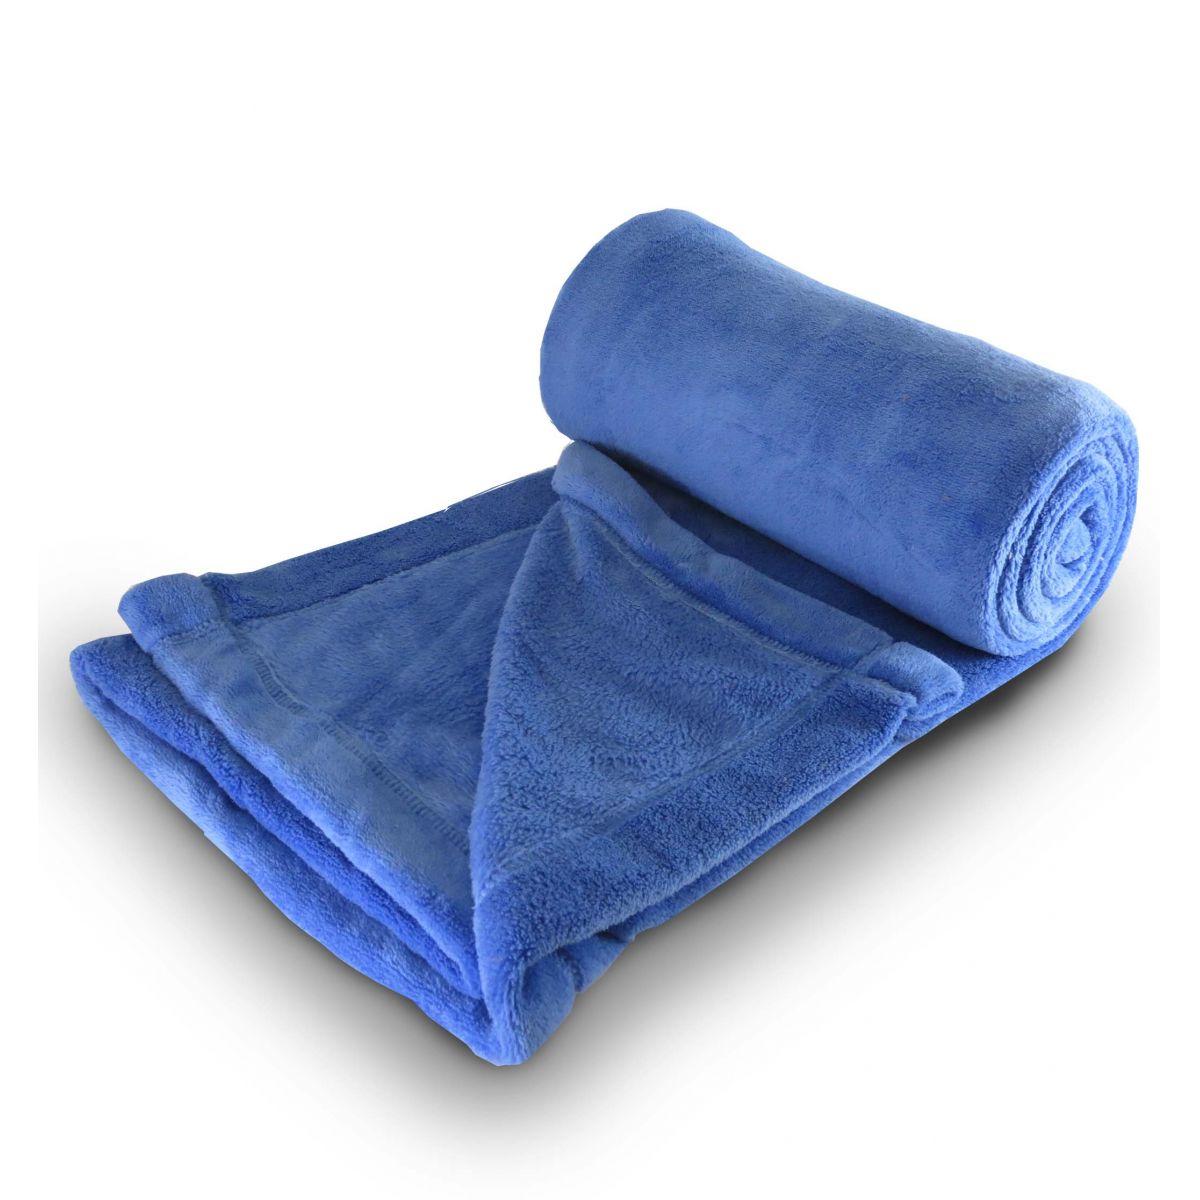 Cobertor de microfibra Solteiro - Azul